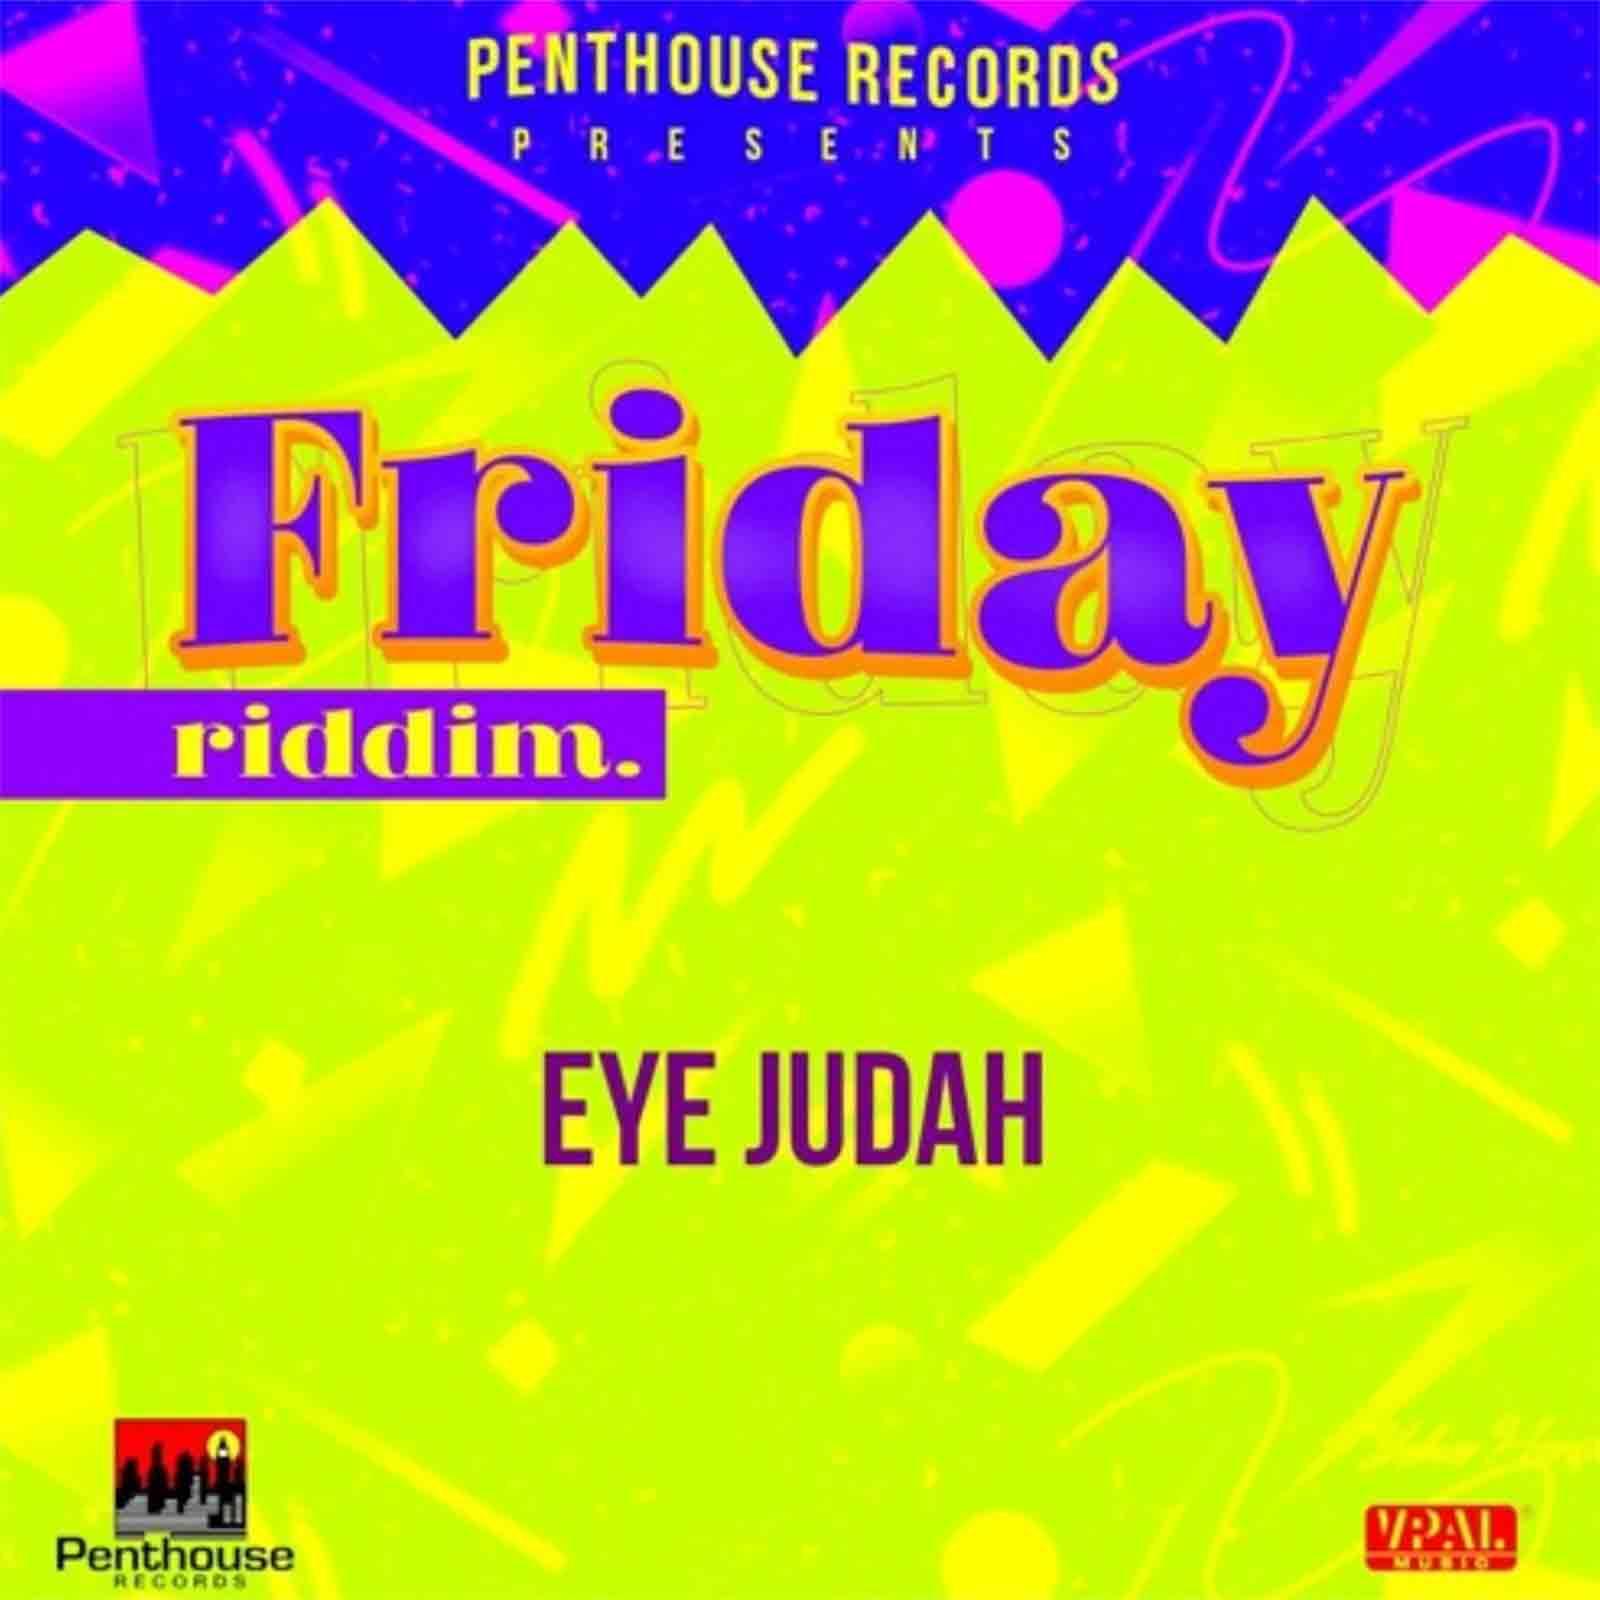 Give Thanks (Friday Riddim) by Eye Judah